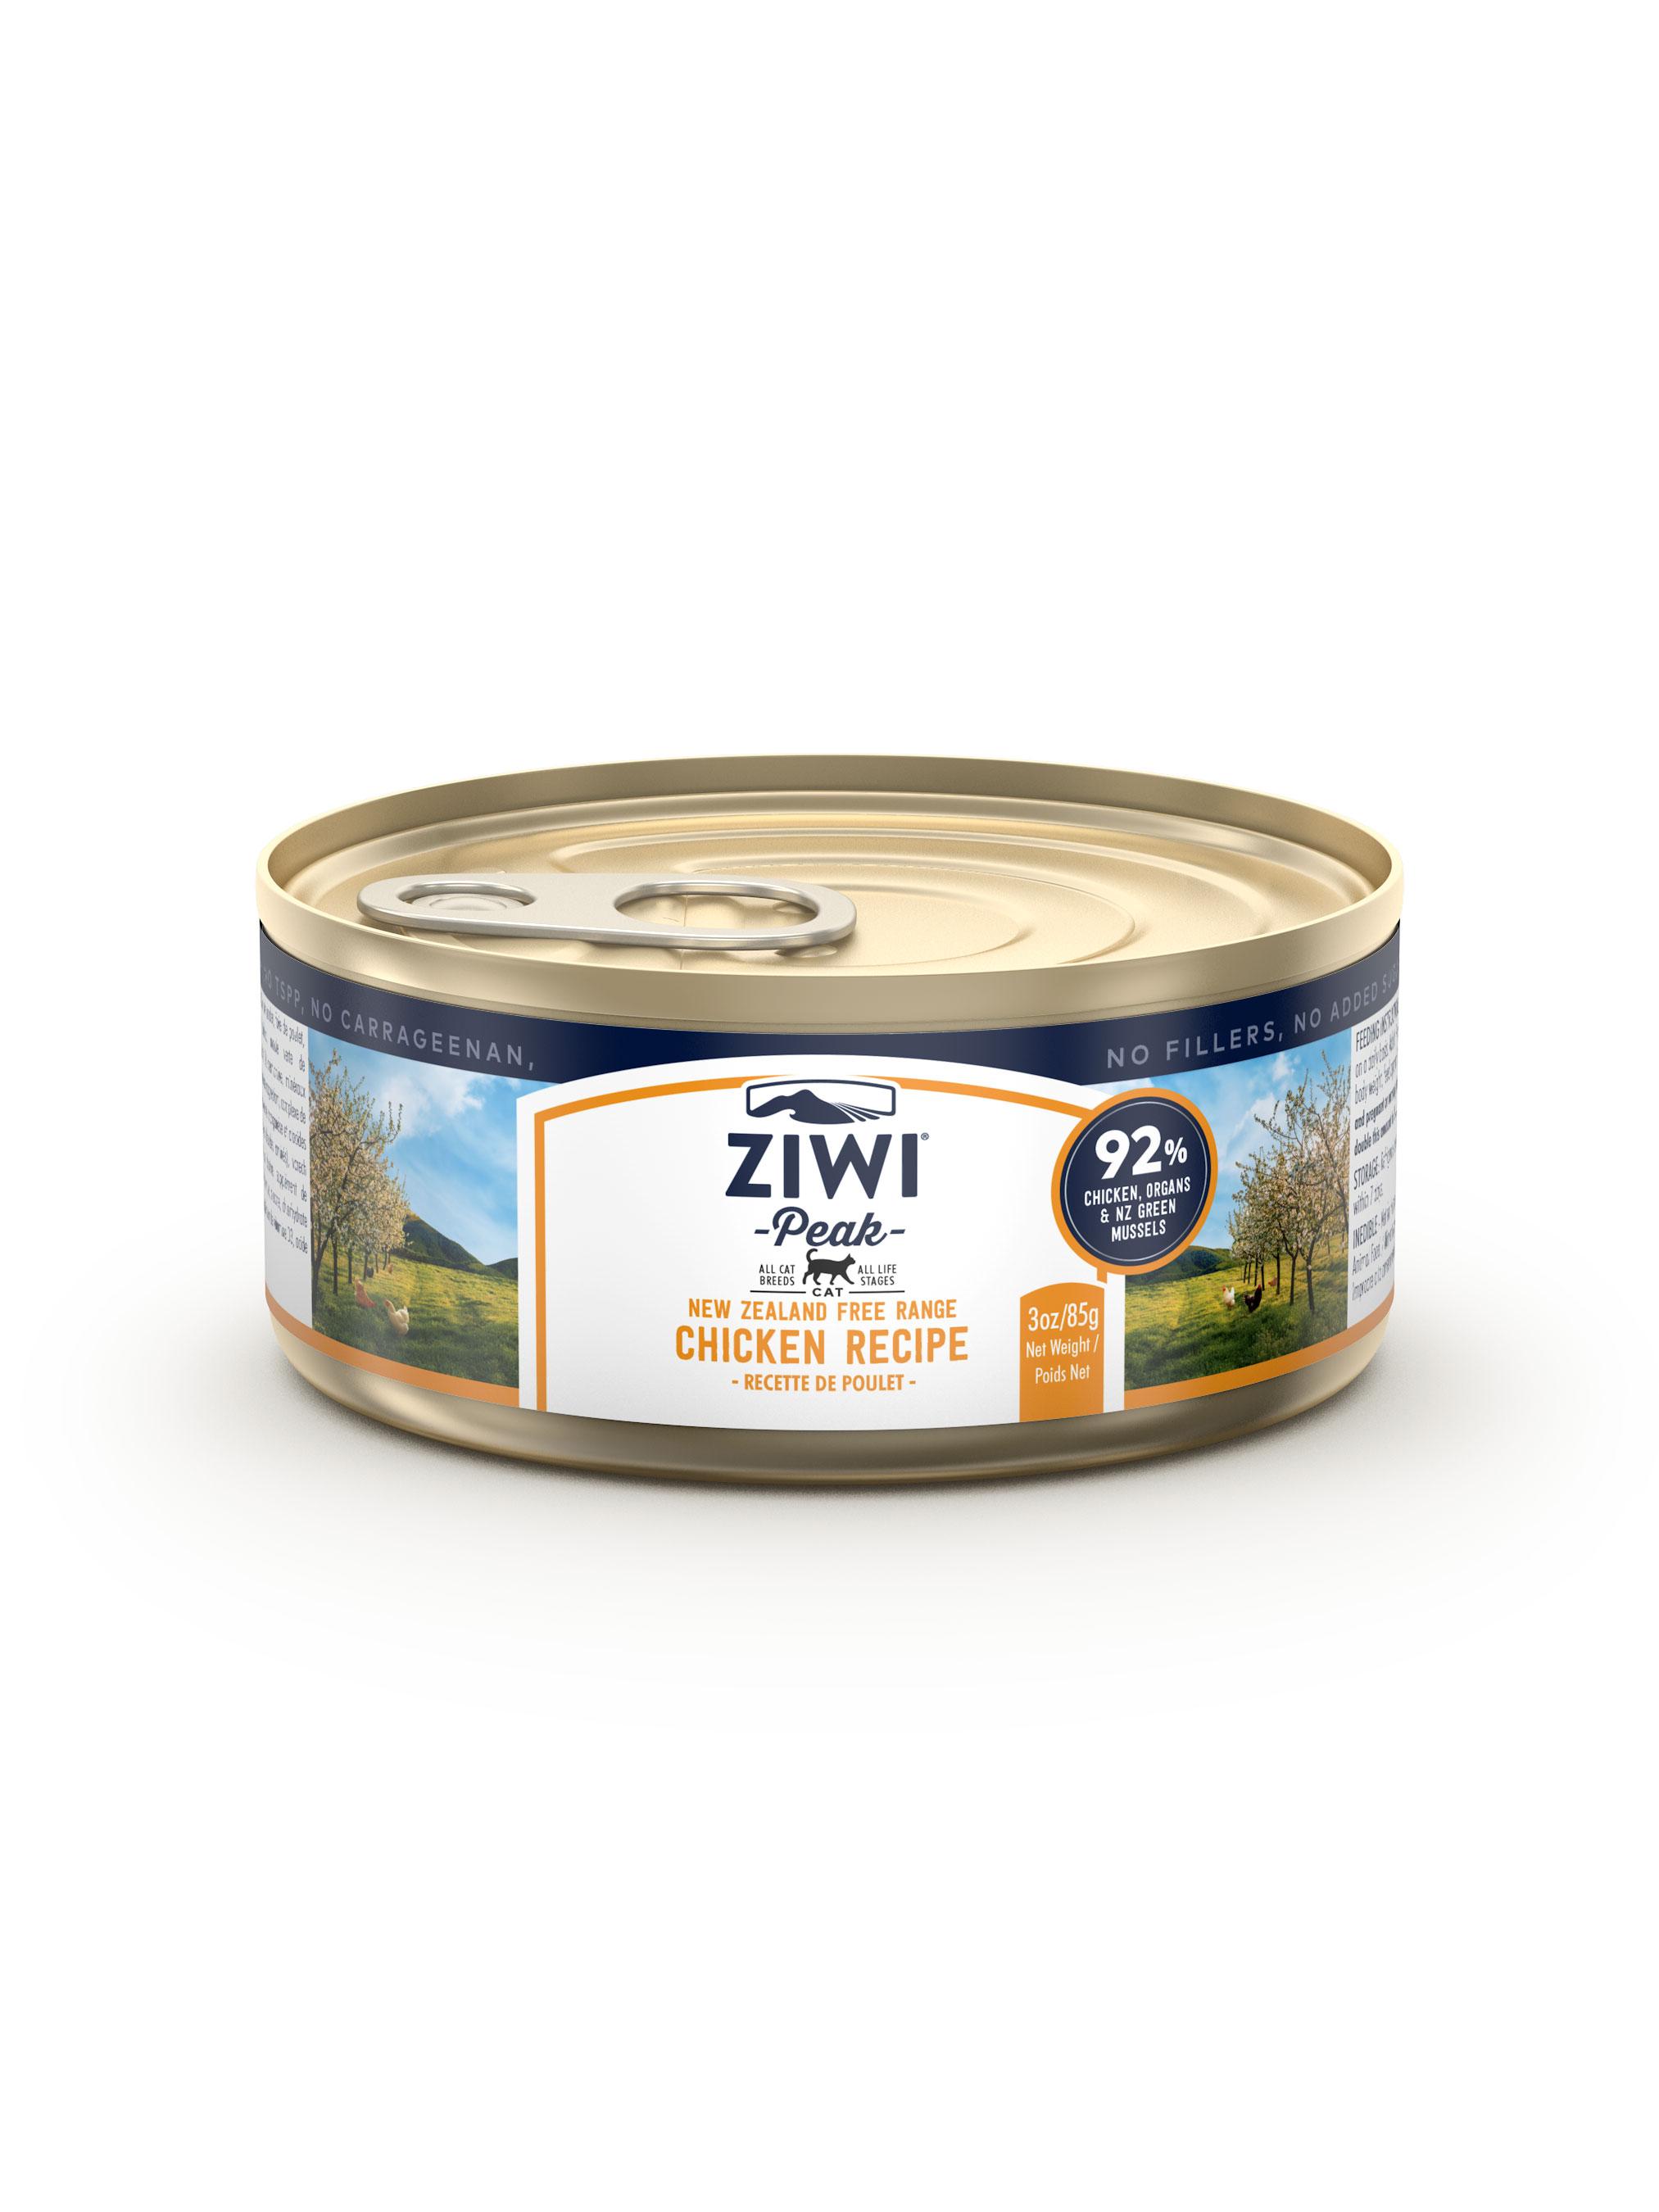 Ziwi Peak Cat Chicken Recipe Canned Cat Food Image